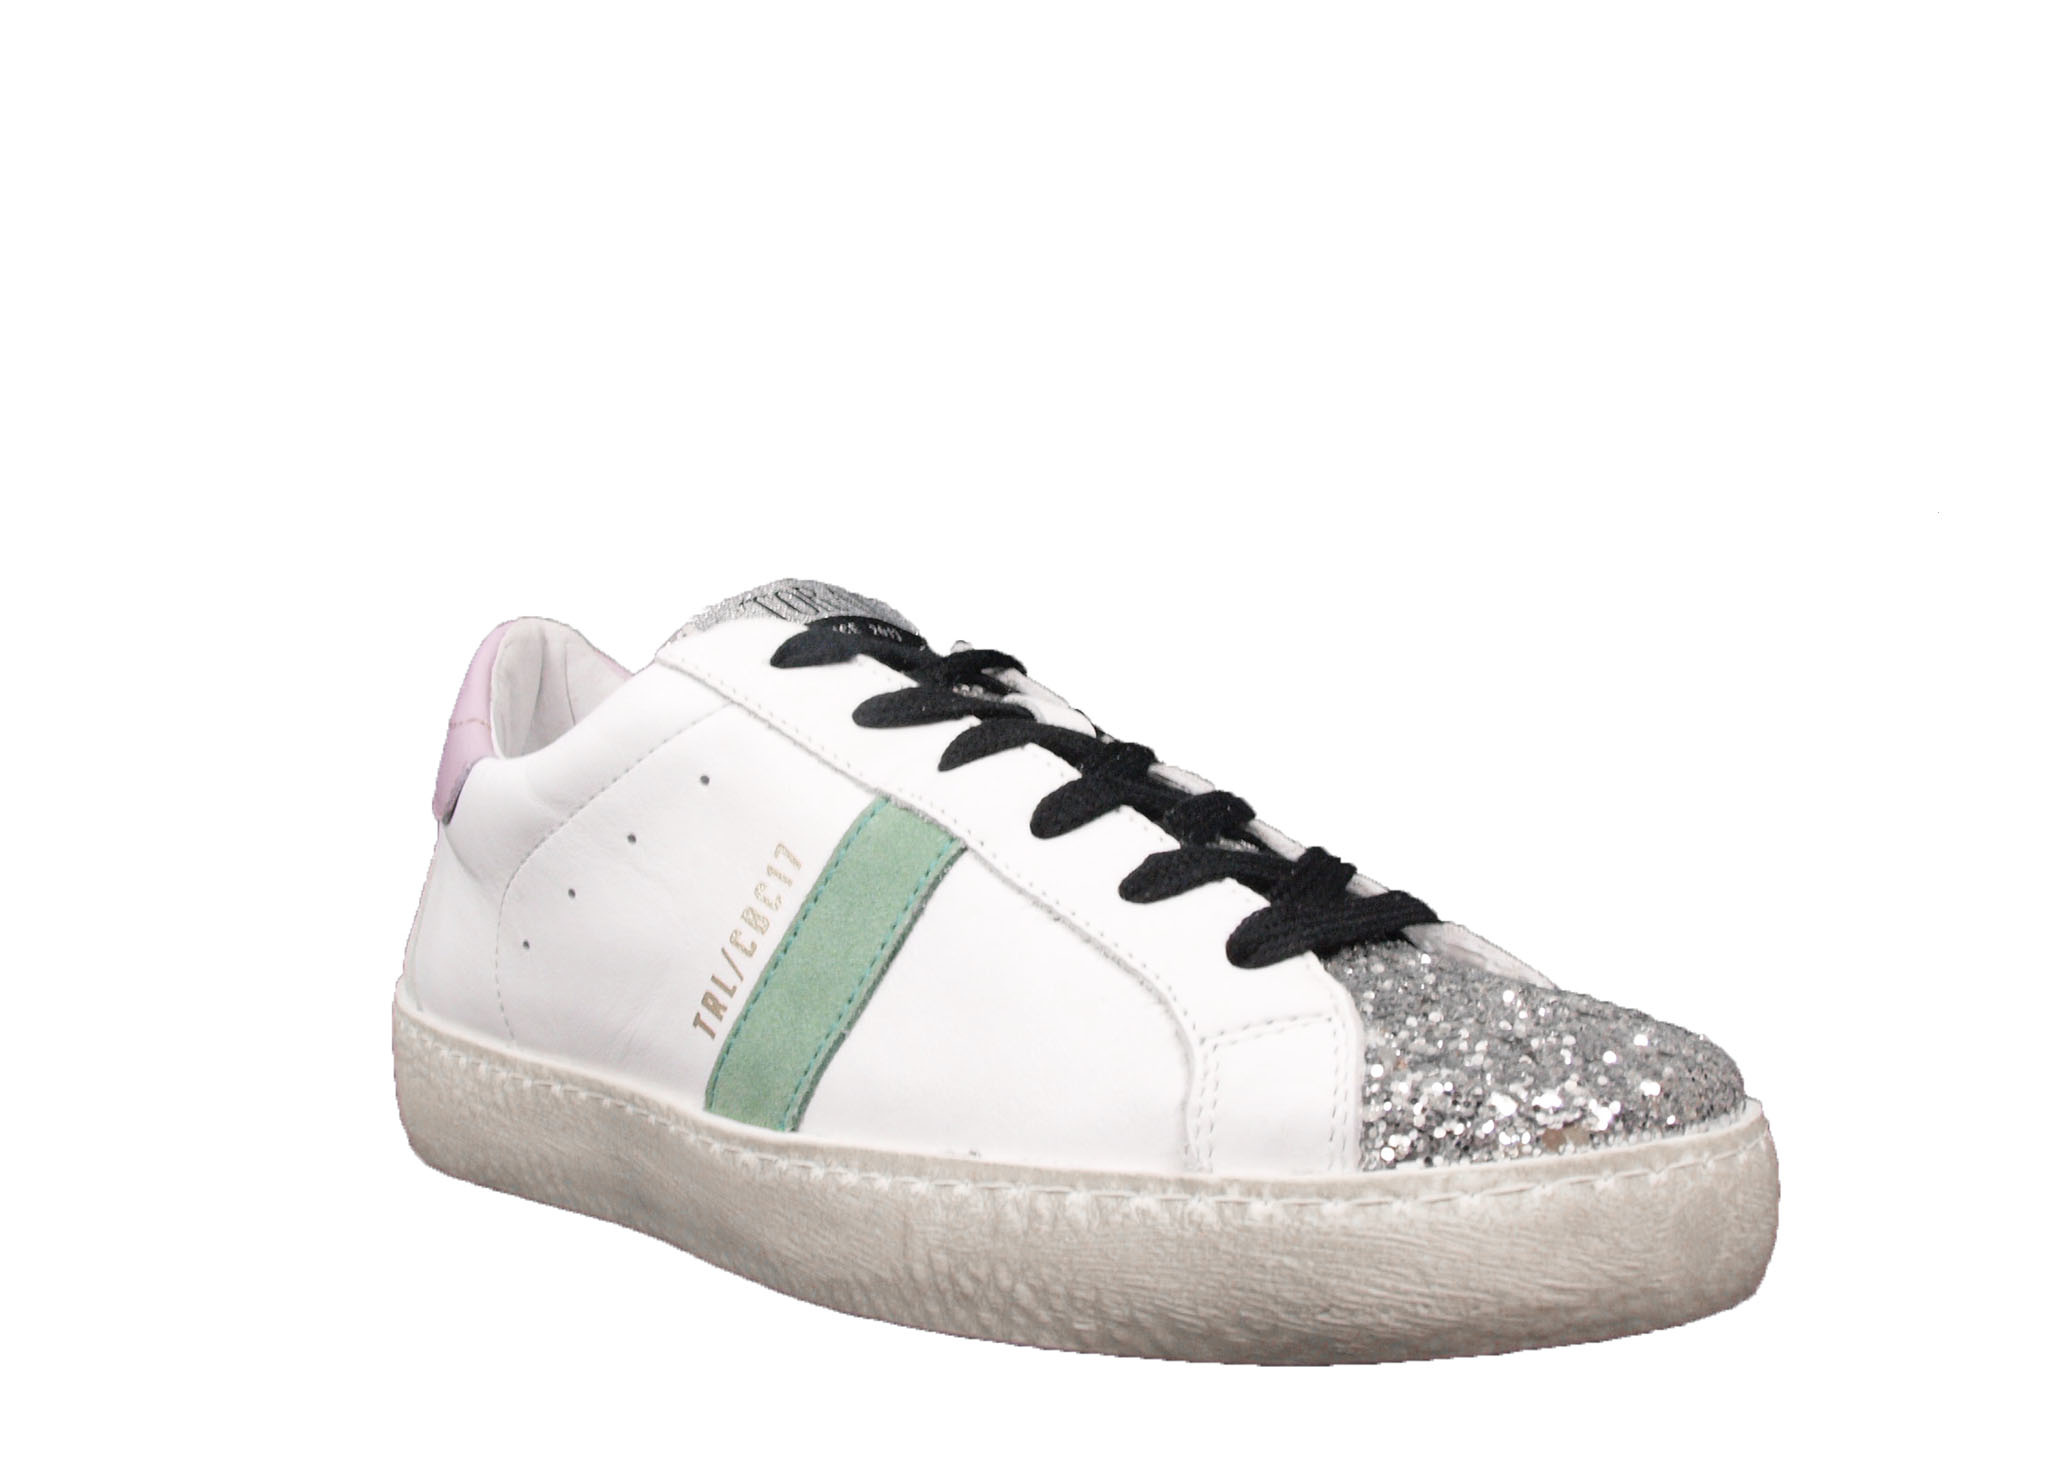 Toral Toral Sneaker Multi TL-12638 Wit/Lila/Groen